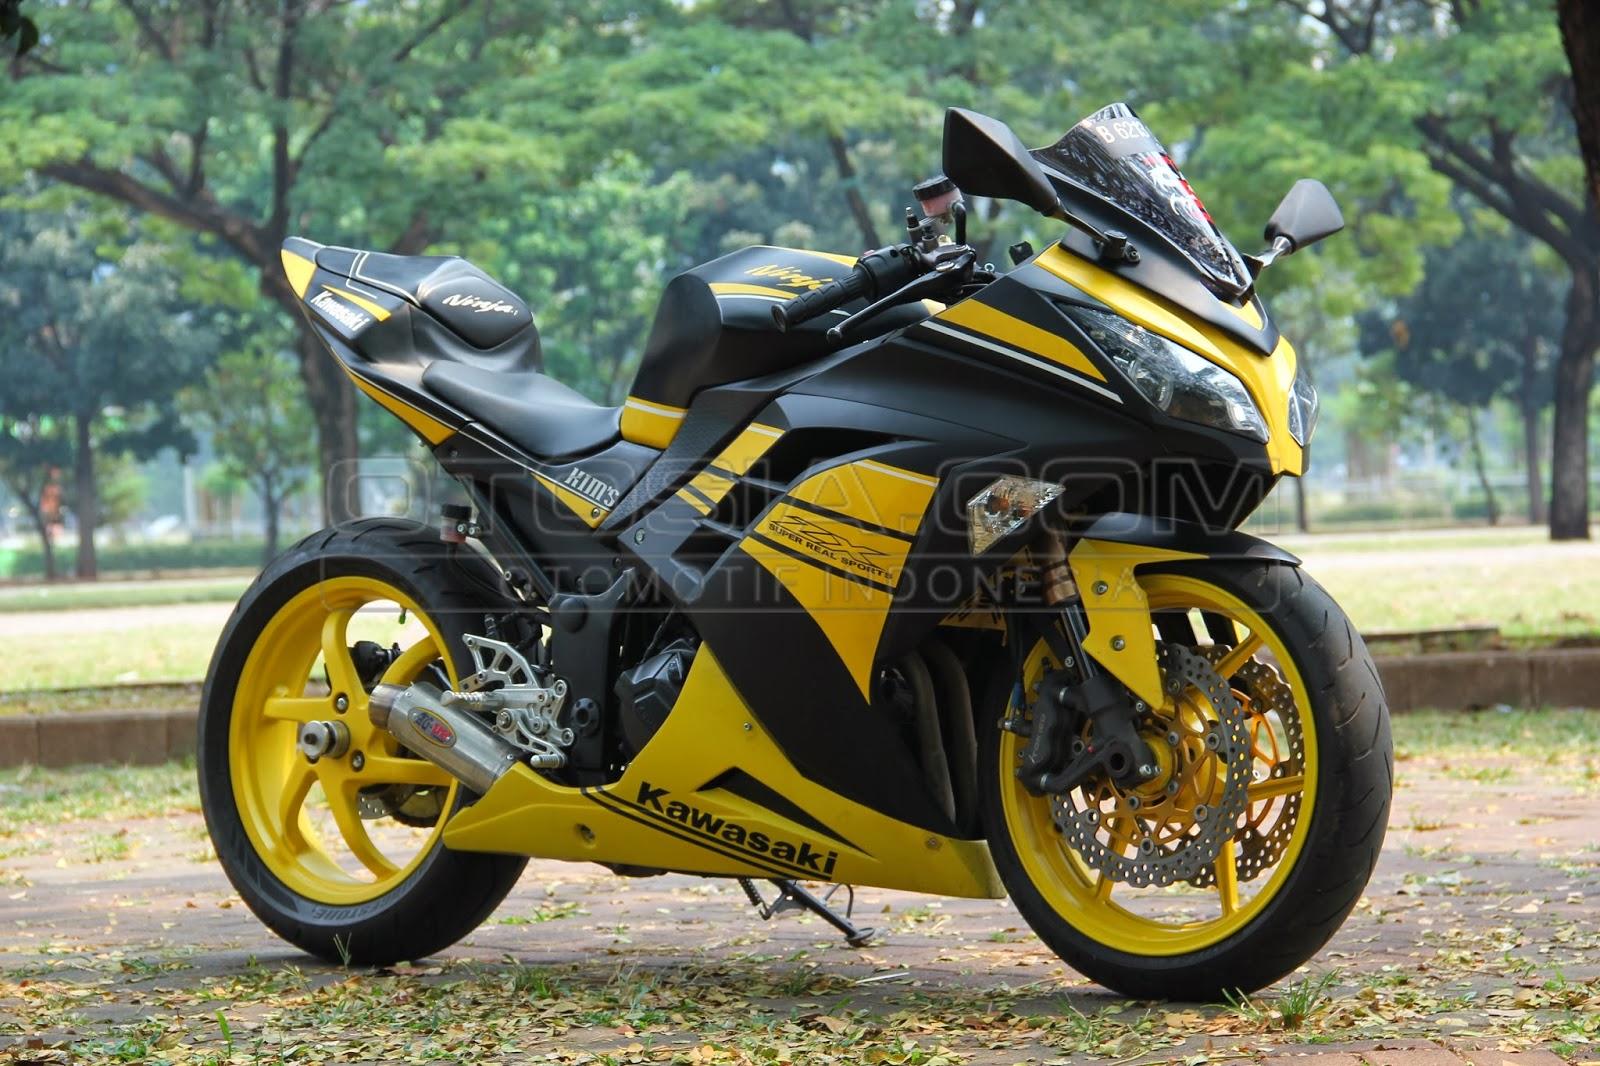 100 Gambar Motor Ninja Warior Modif Sobat Modifikasi